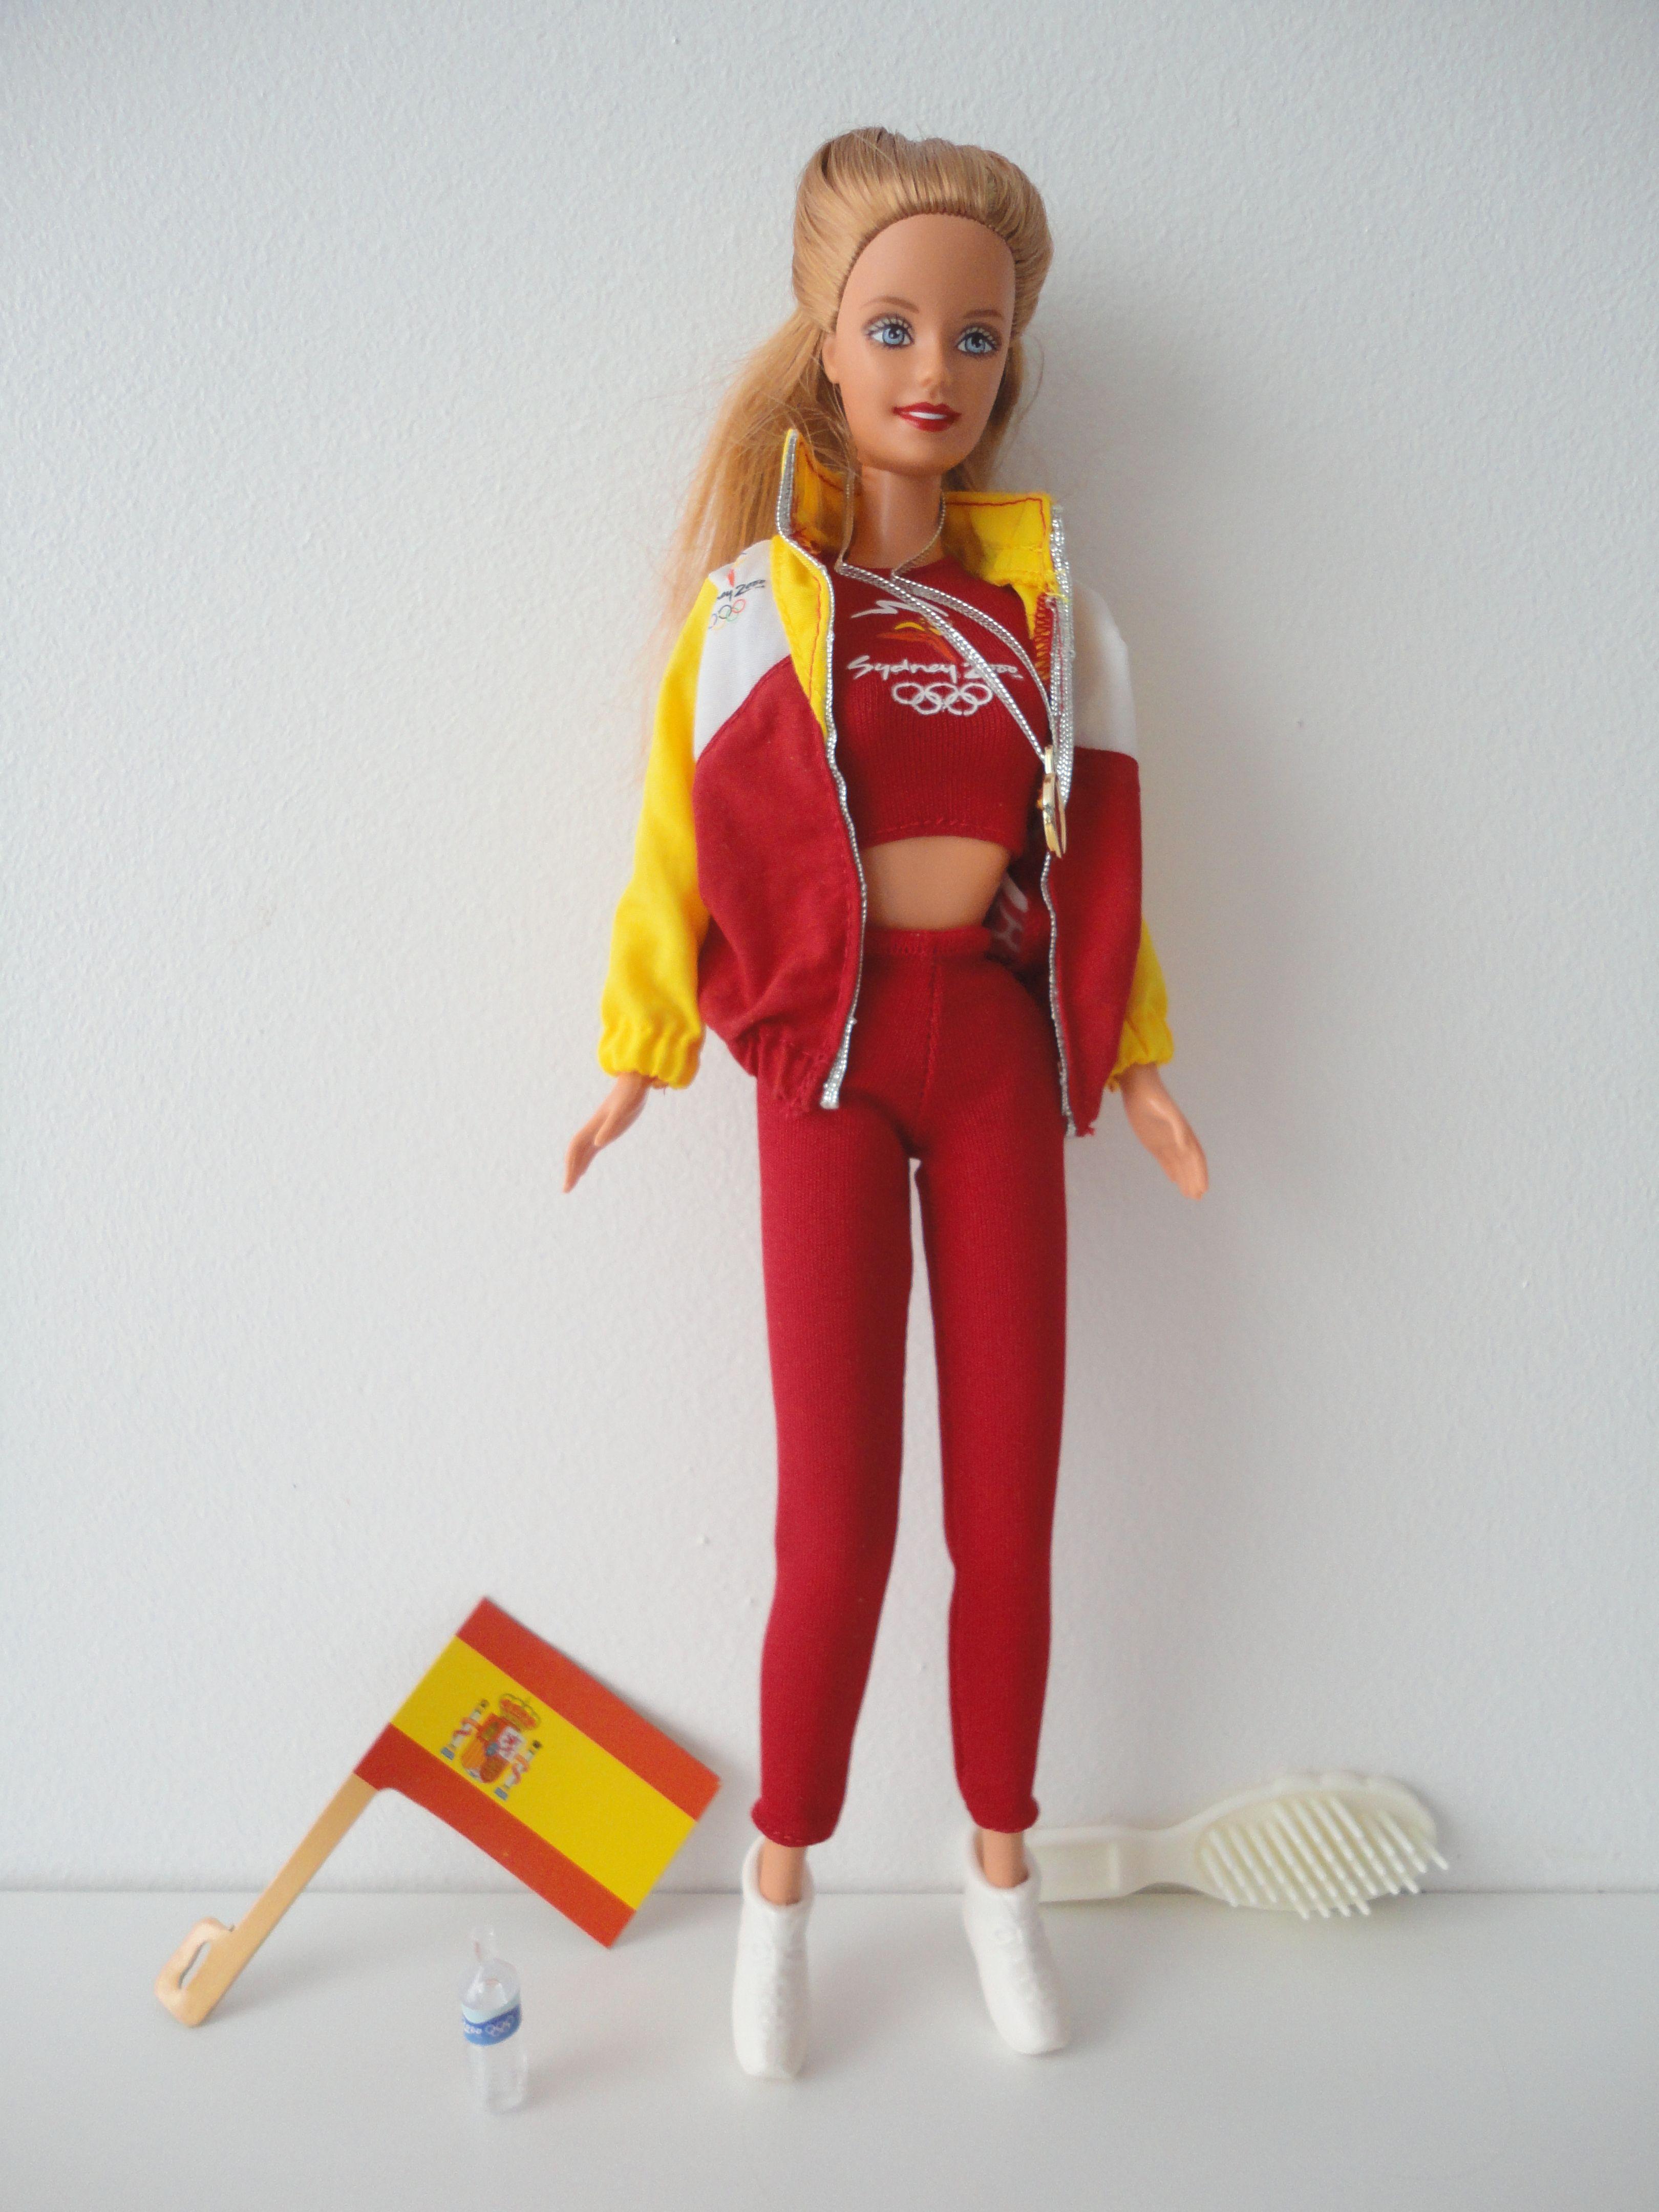 Barbie Olympic Sydney 2000 Spain BD1999 25979 in 2020